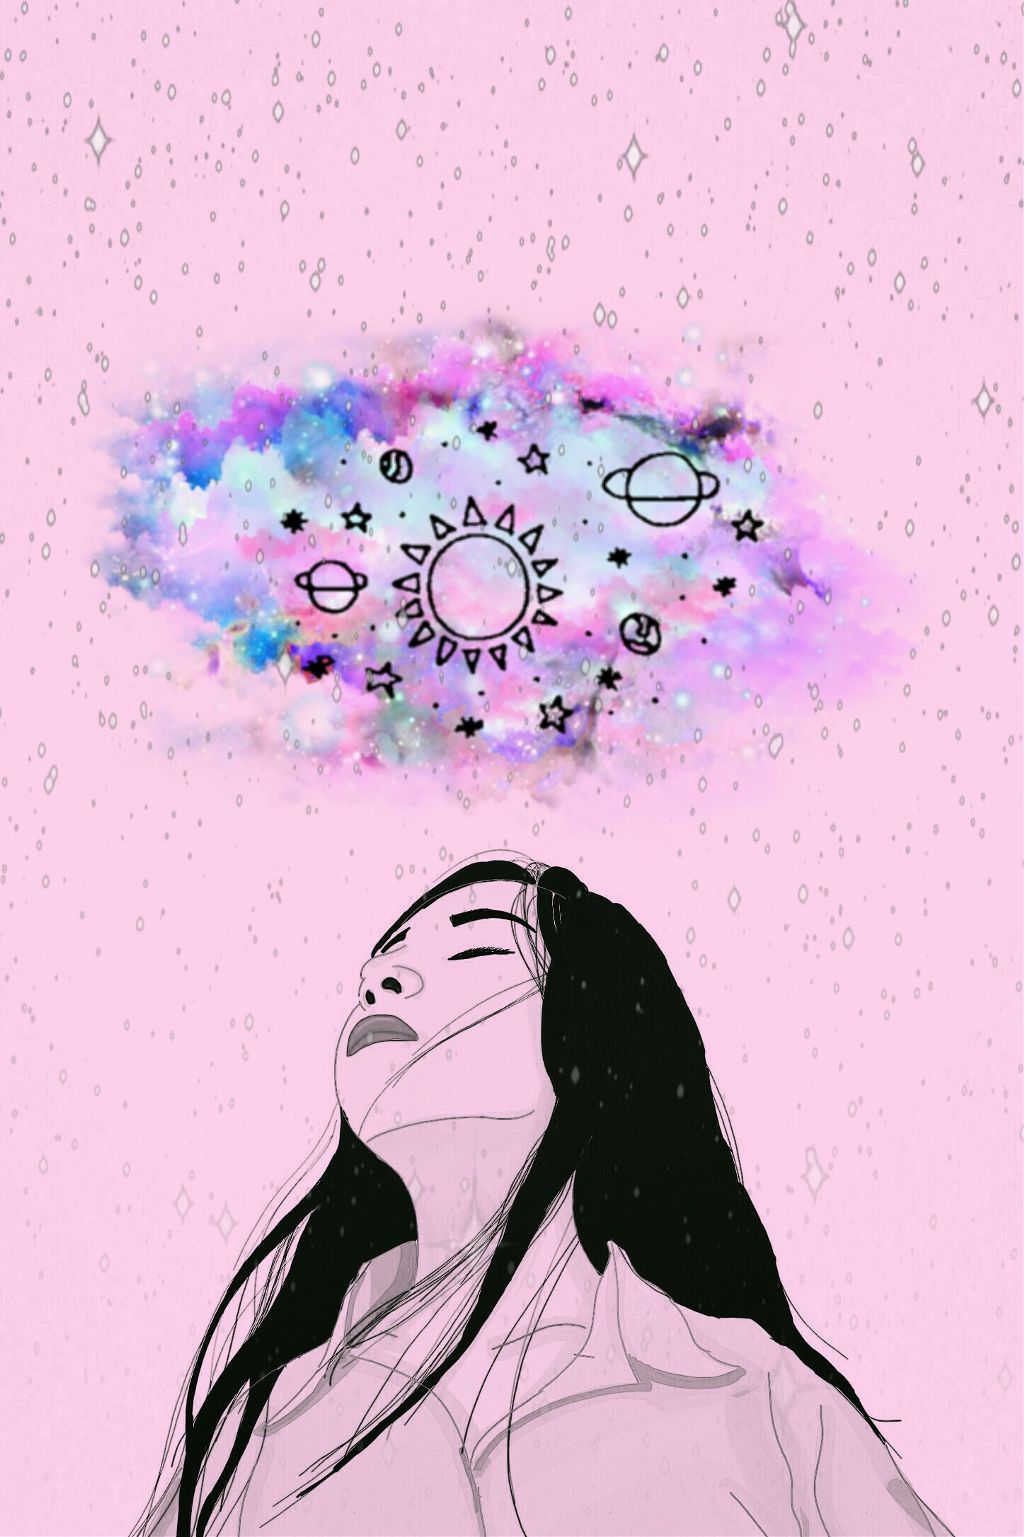 #pink #galaxy #desenho #draw #girl